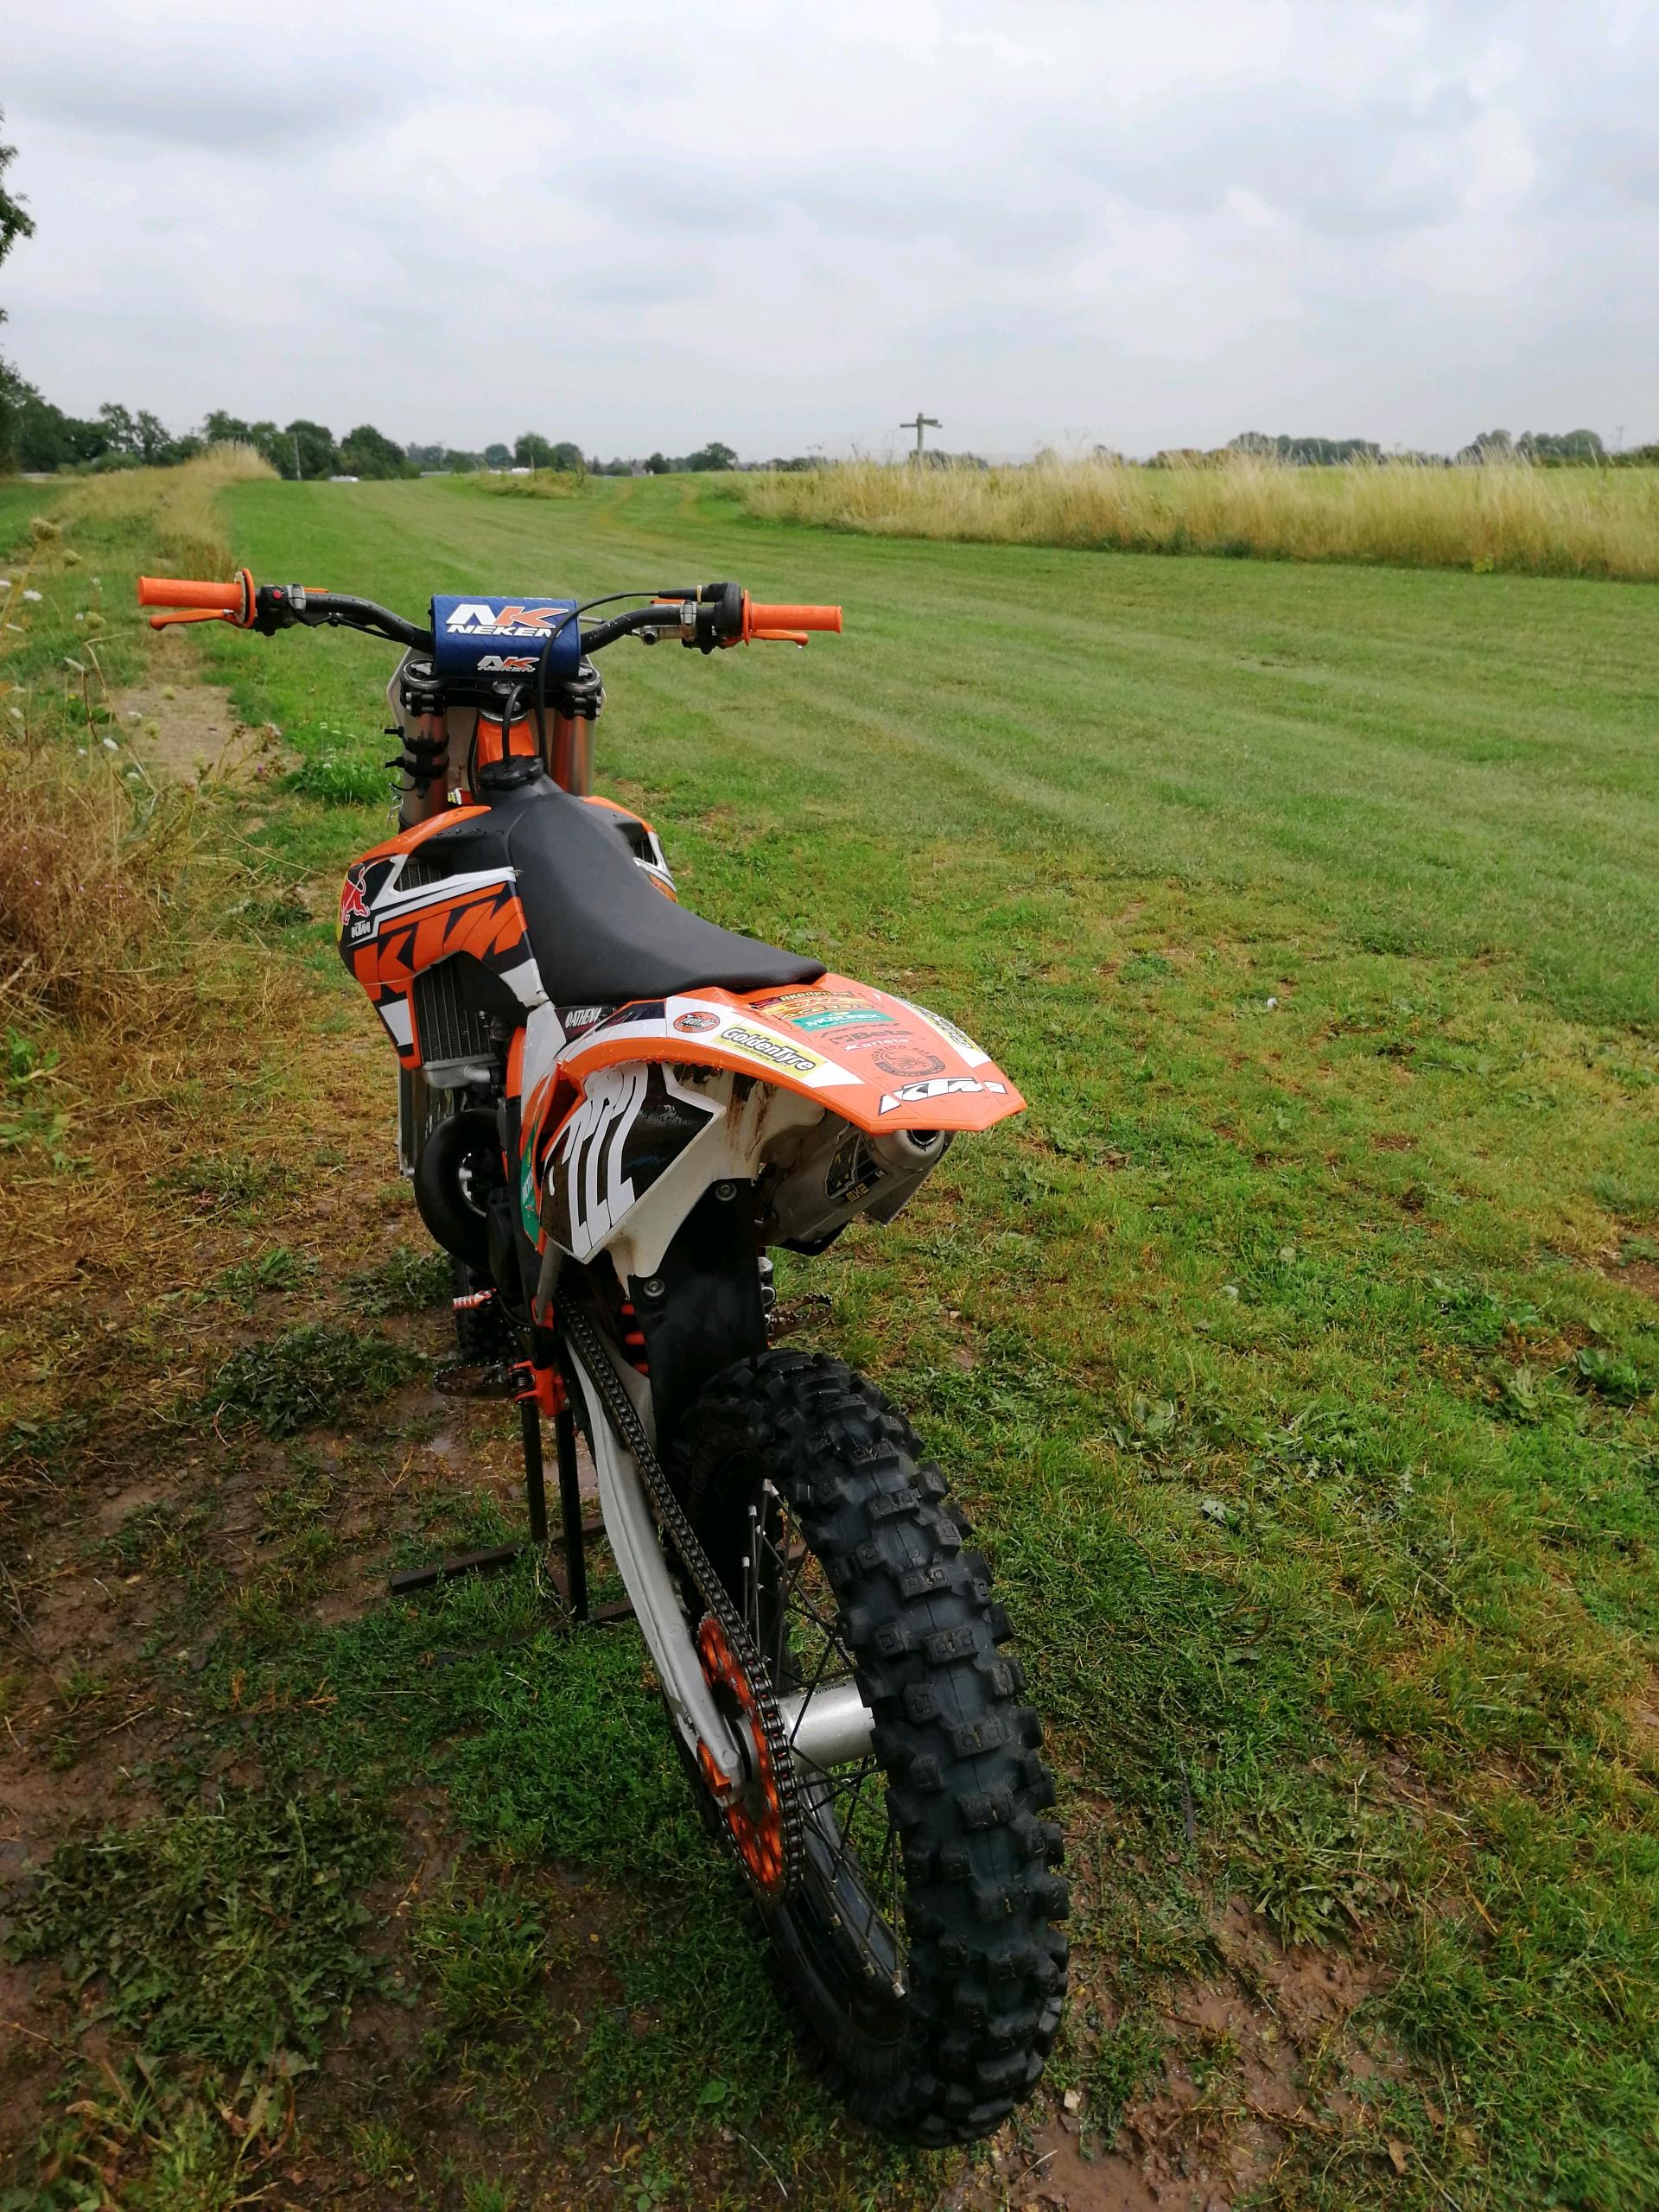 Distinctive motorbike stolen - can you help police enquiries?